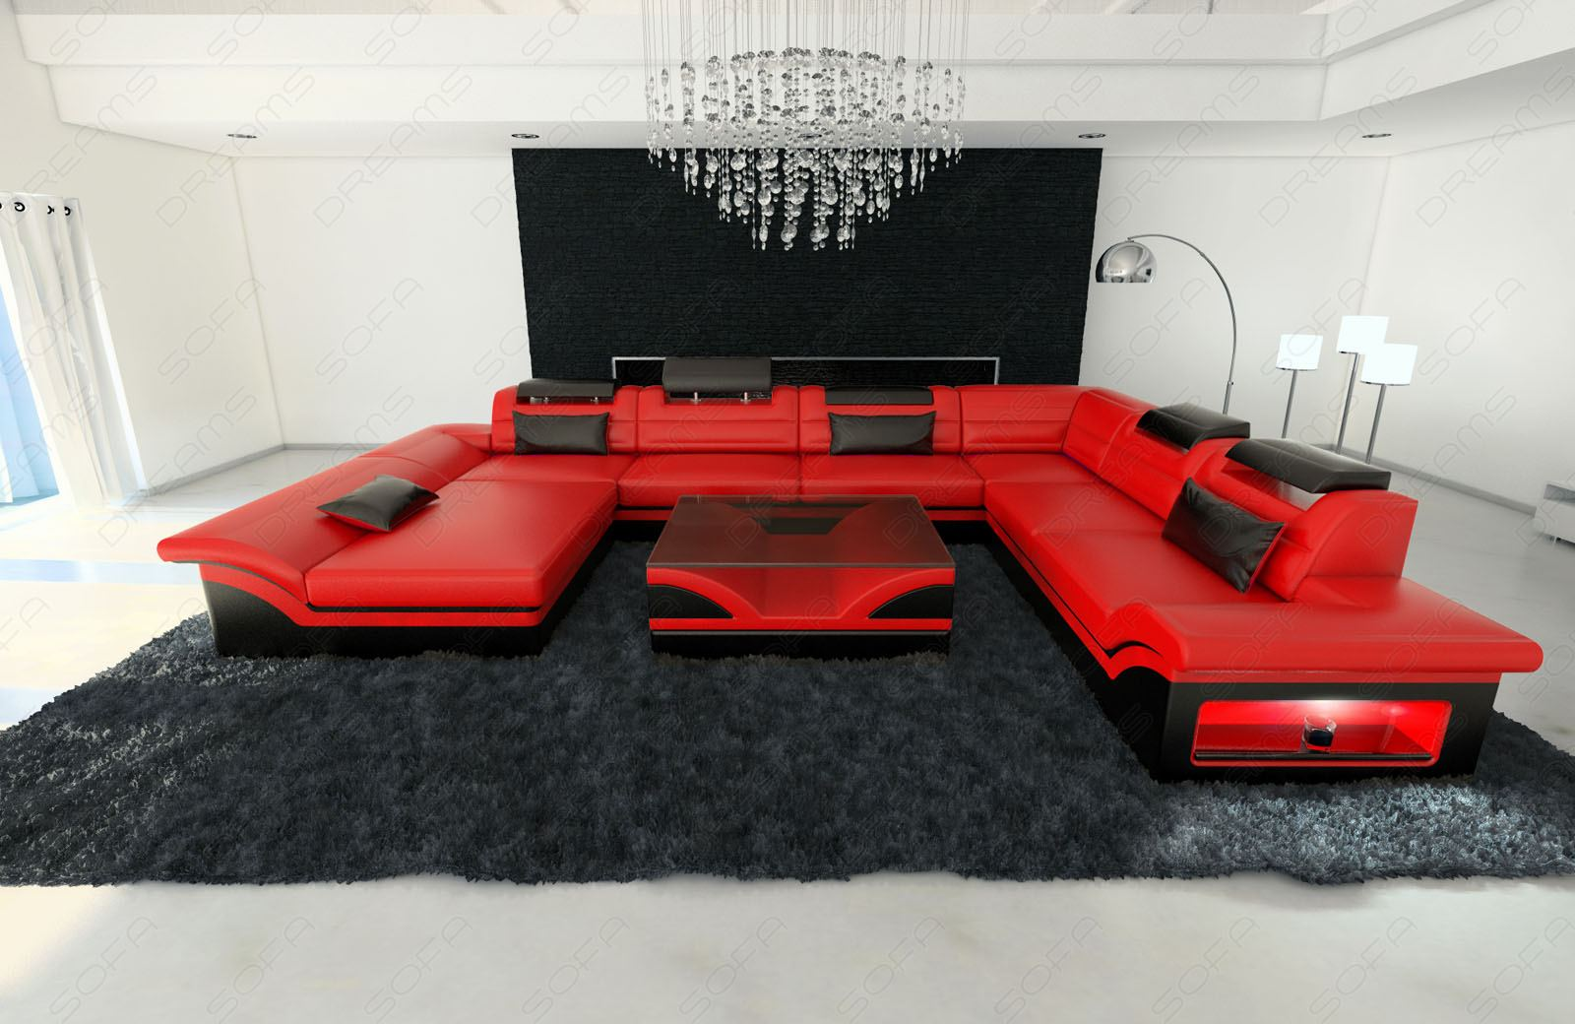 echtleder design wohnlandschaft enzo xxl ottomane led beleuchtung rot schwarz ebay. Black Bedroom Furniture Sets. Home Design Ideas